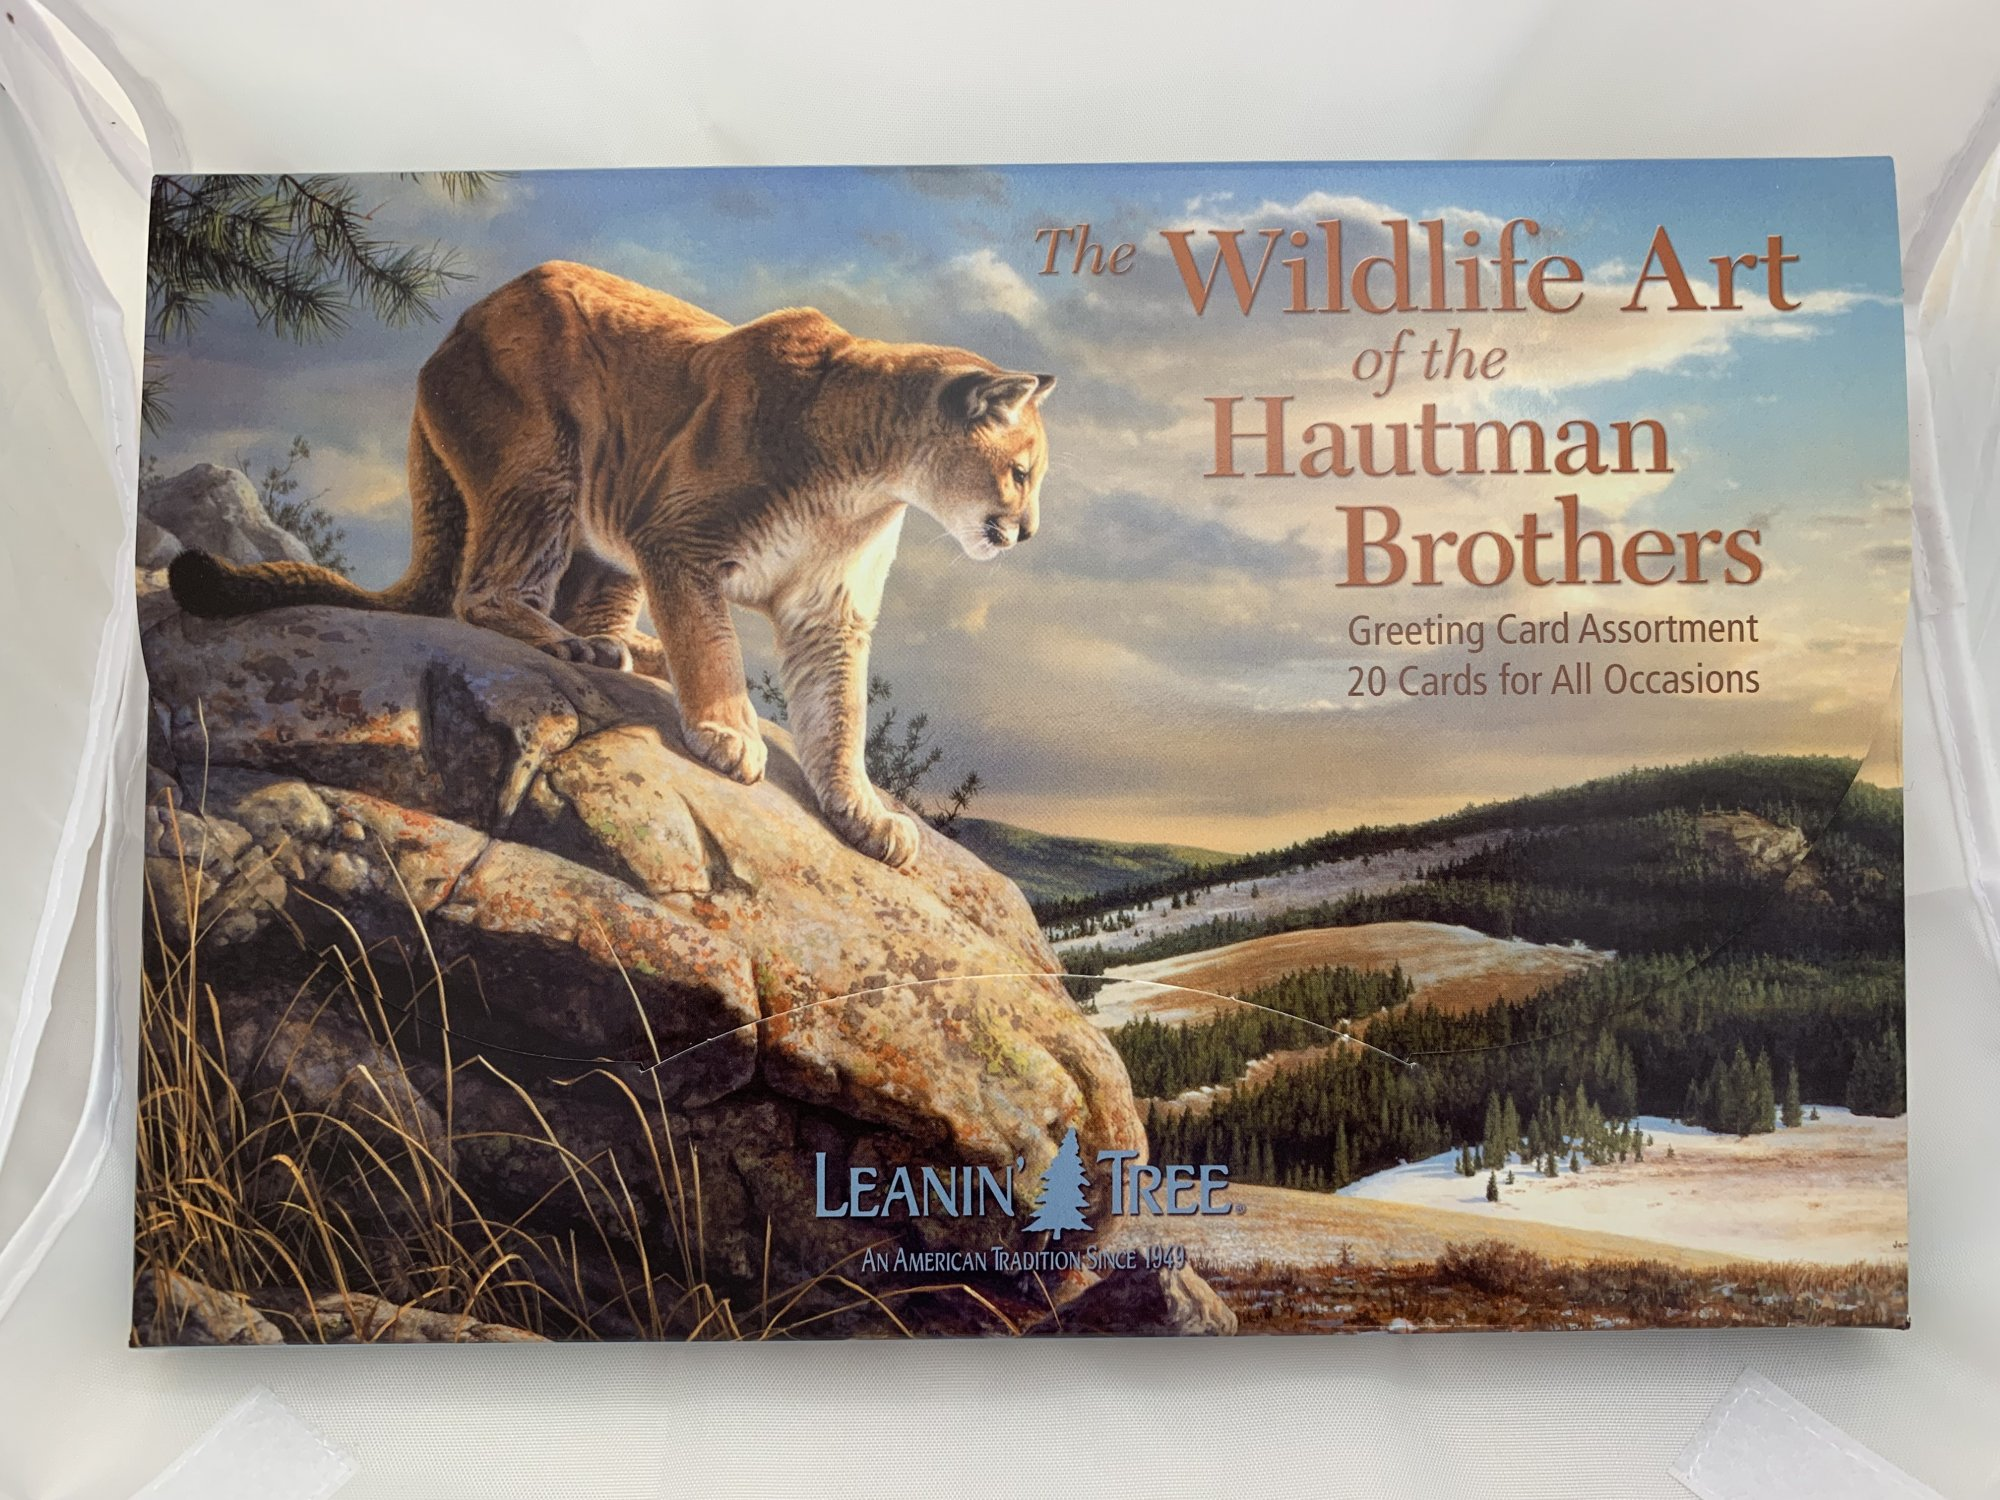 Wildlife Art of the Hautman Brothers Greeting Card Assortment